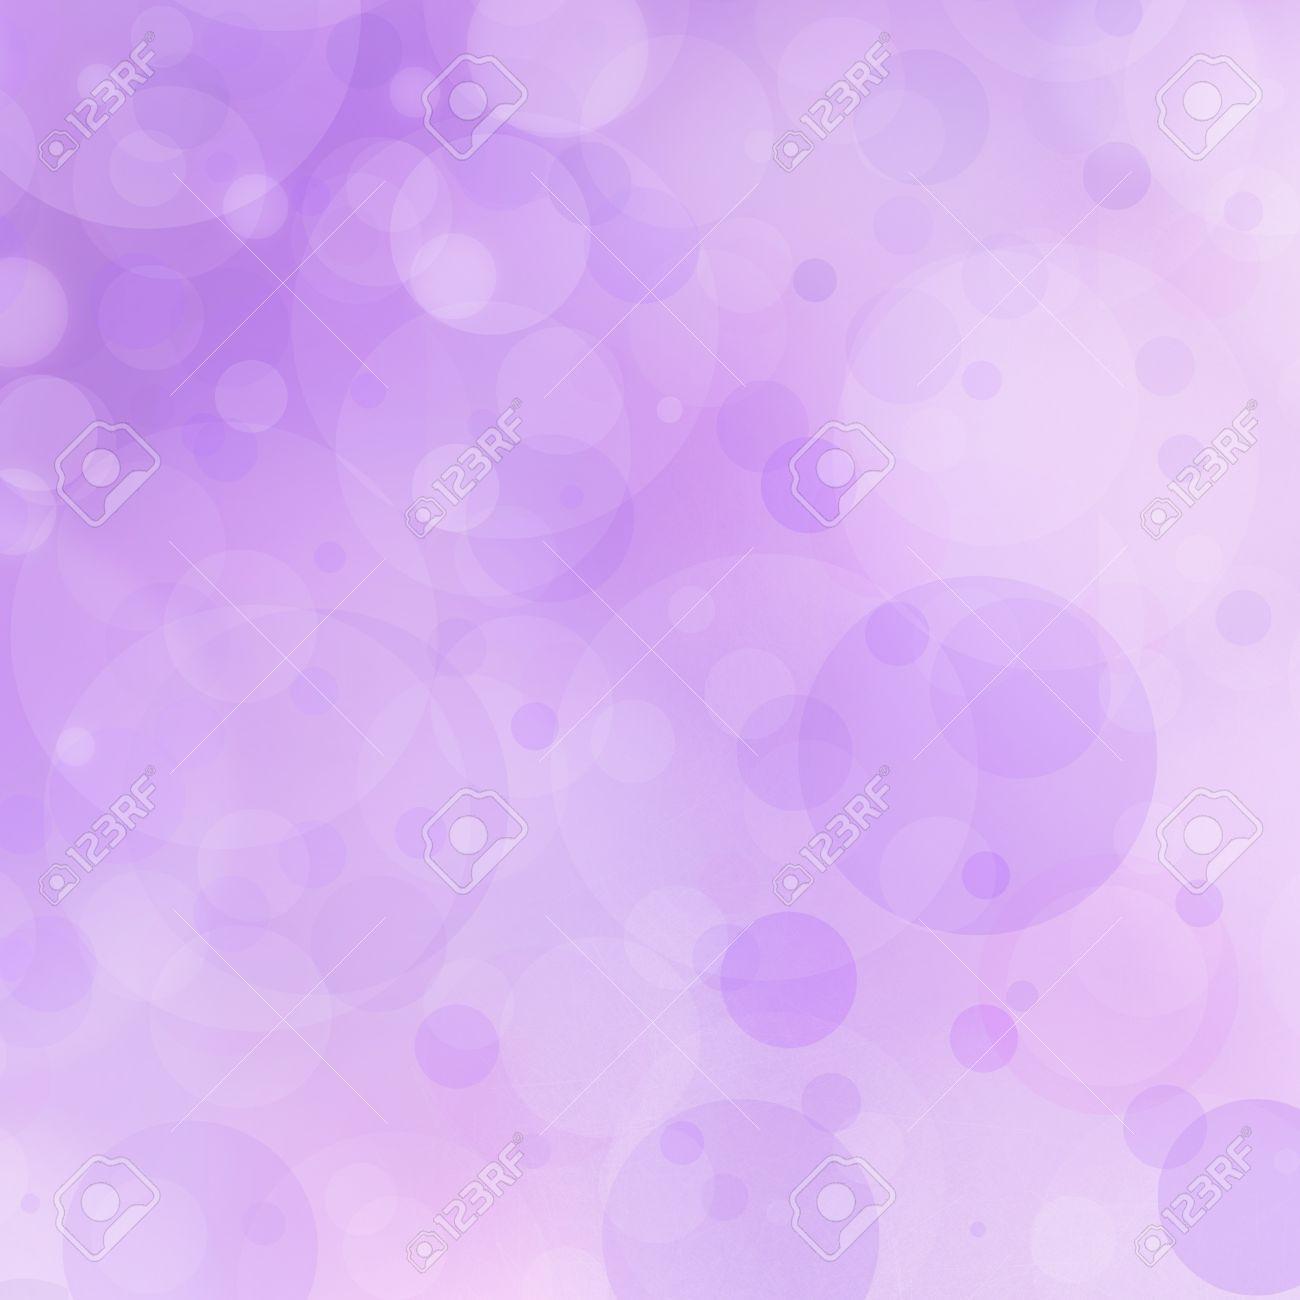 purple background bokeh lights circle bubble shape white lights design on pastel purple color stock photo